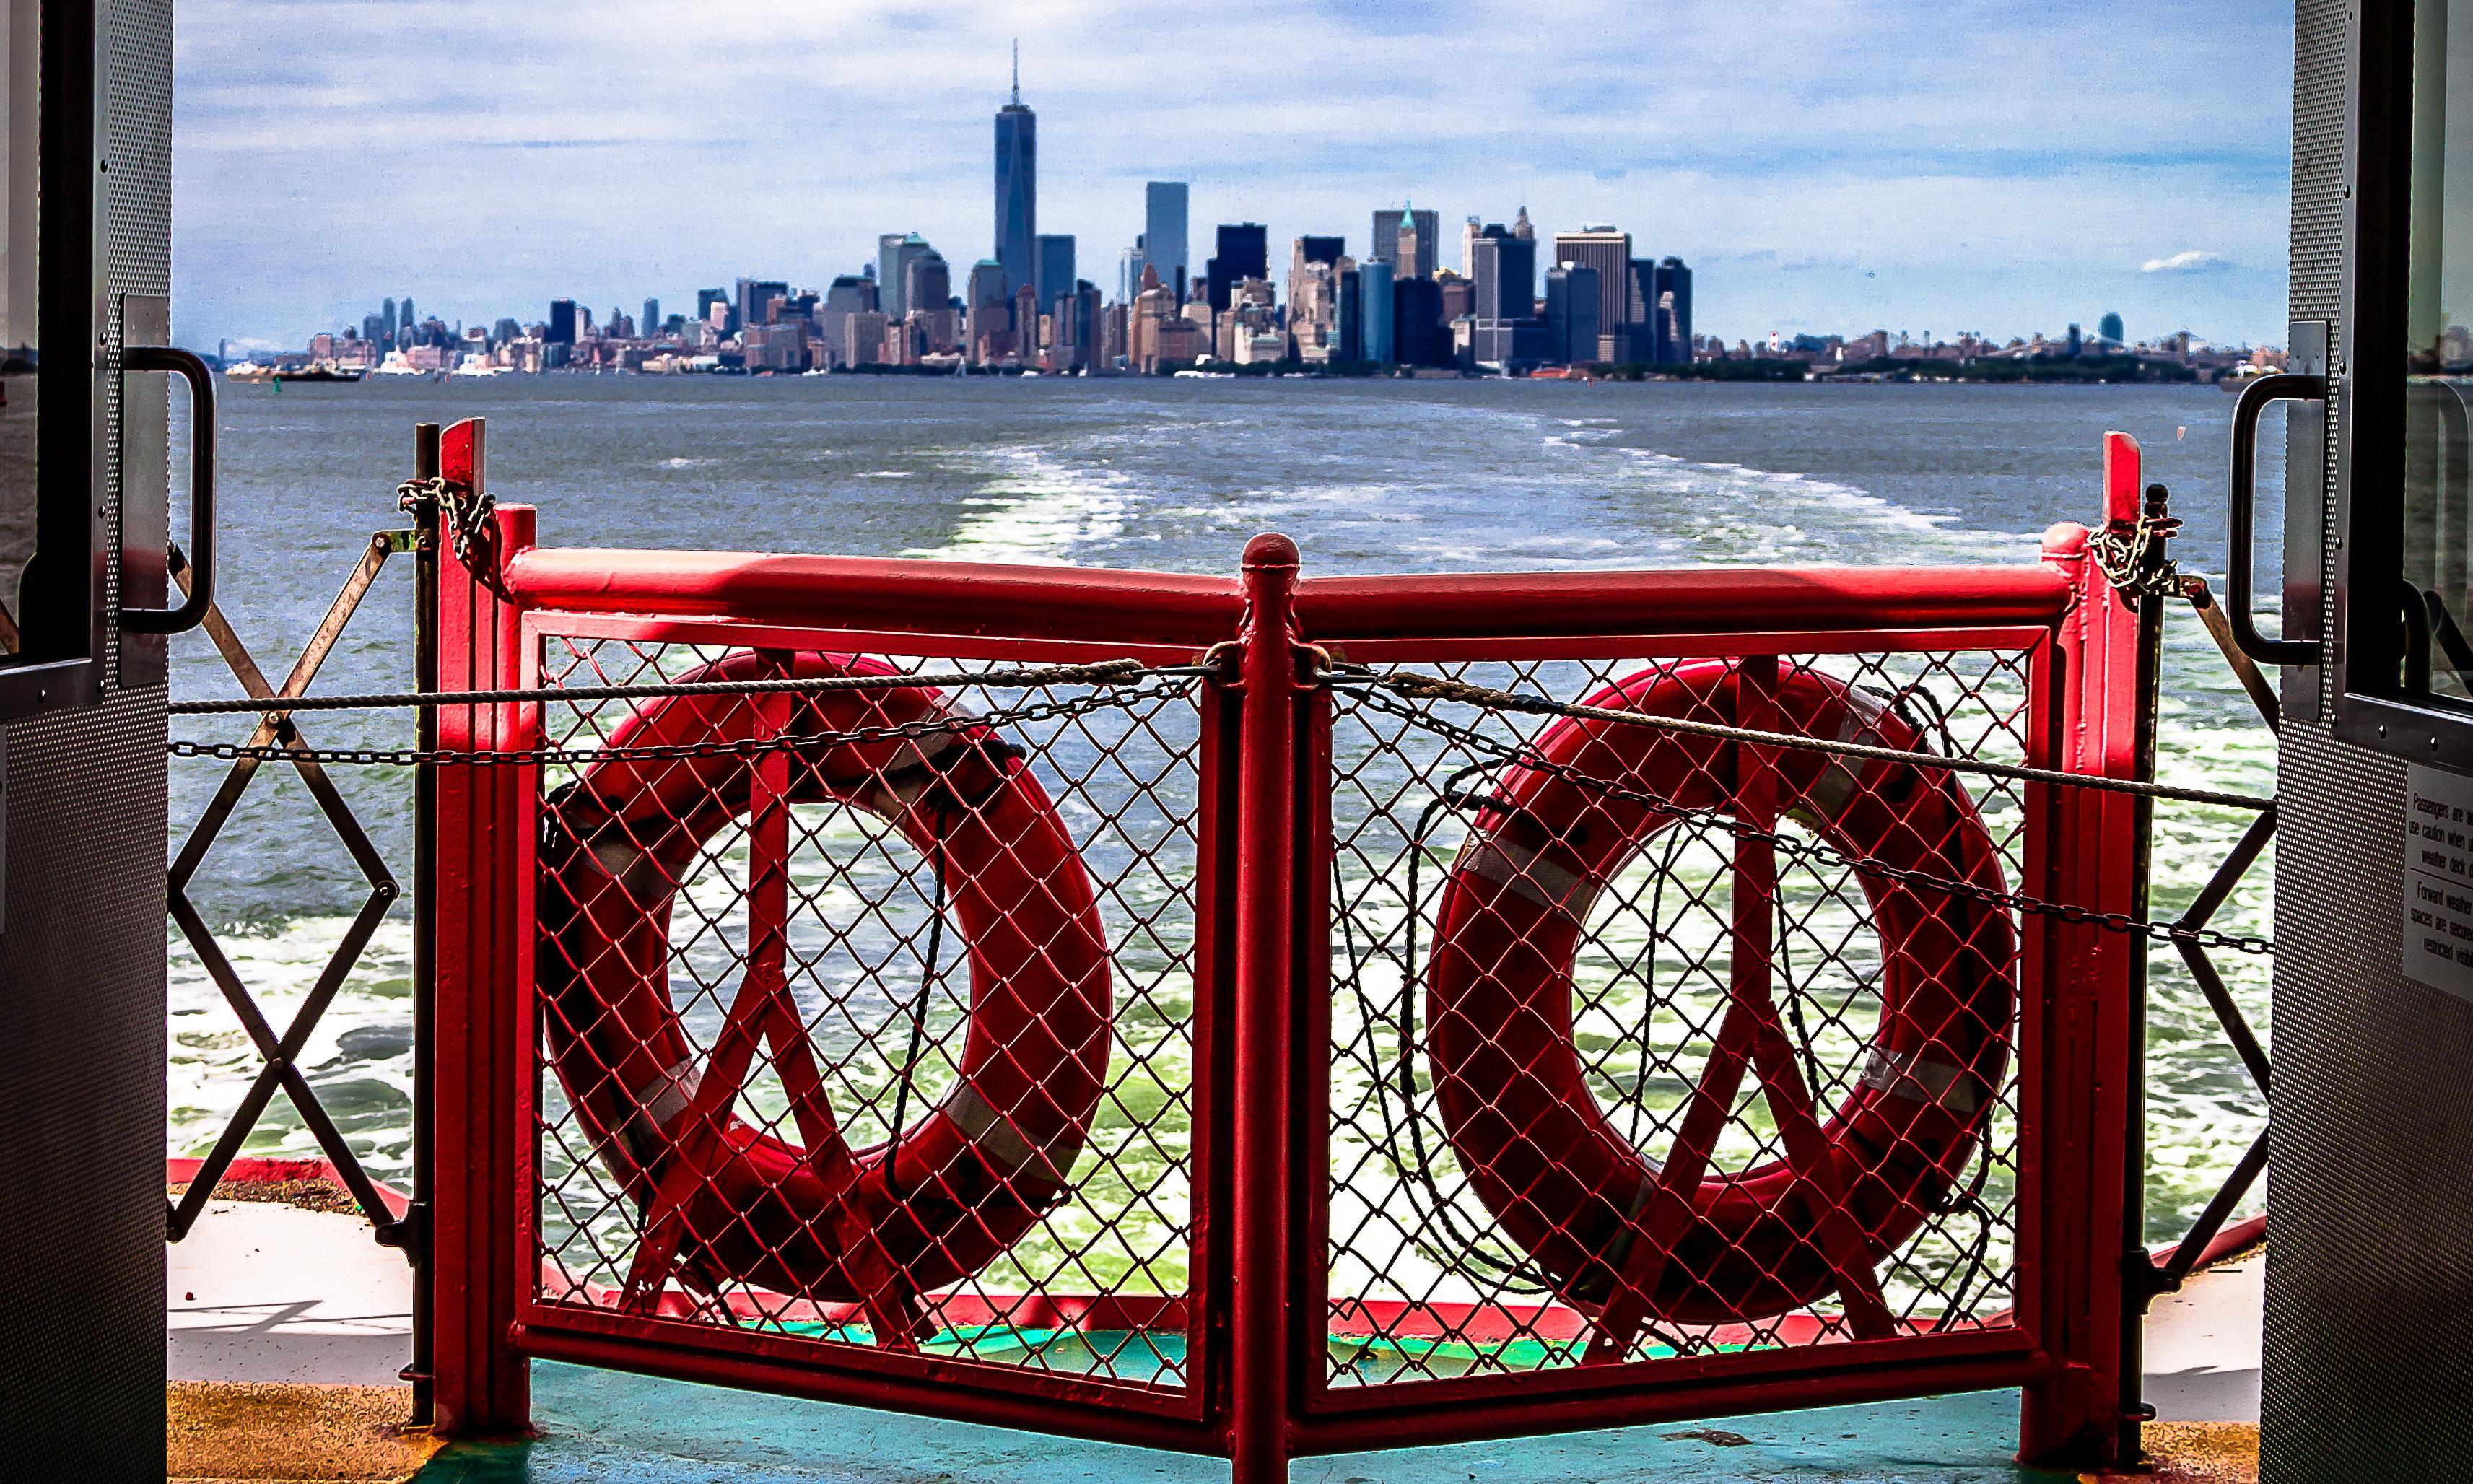 Manhattan transfers: New York's boroughs by ferry